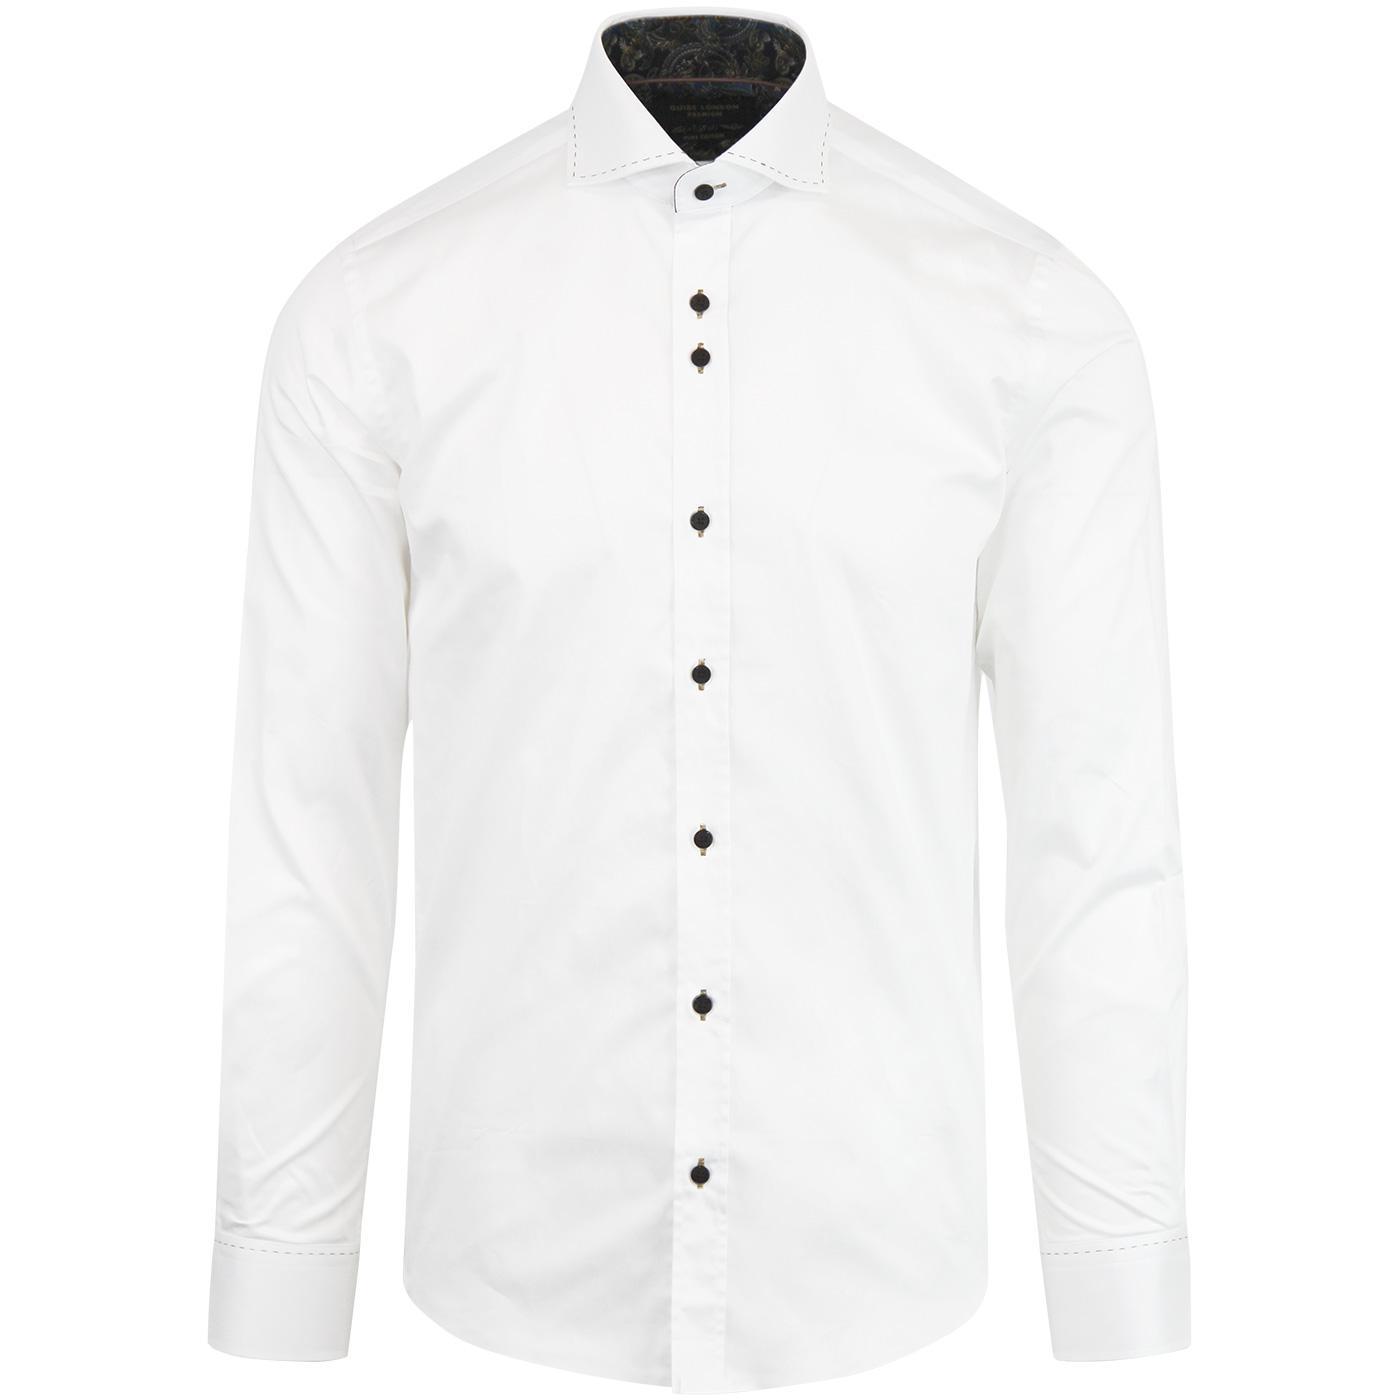 GUIDE LONDON 60s Mod Stitch Collar Smart Shirt (W)